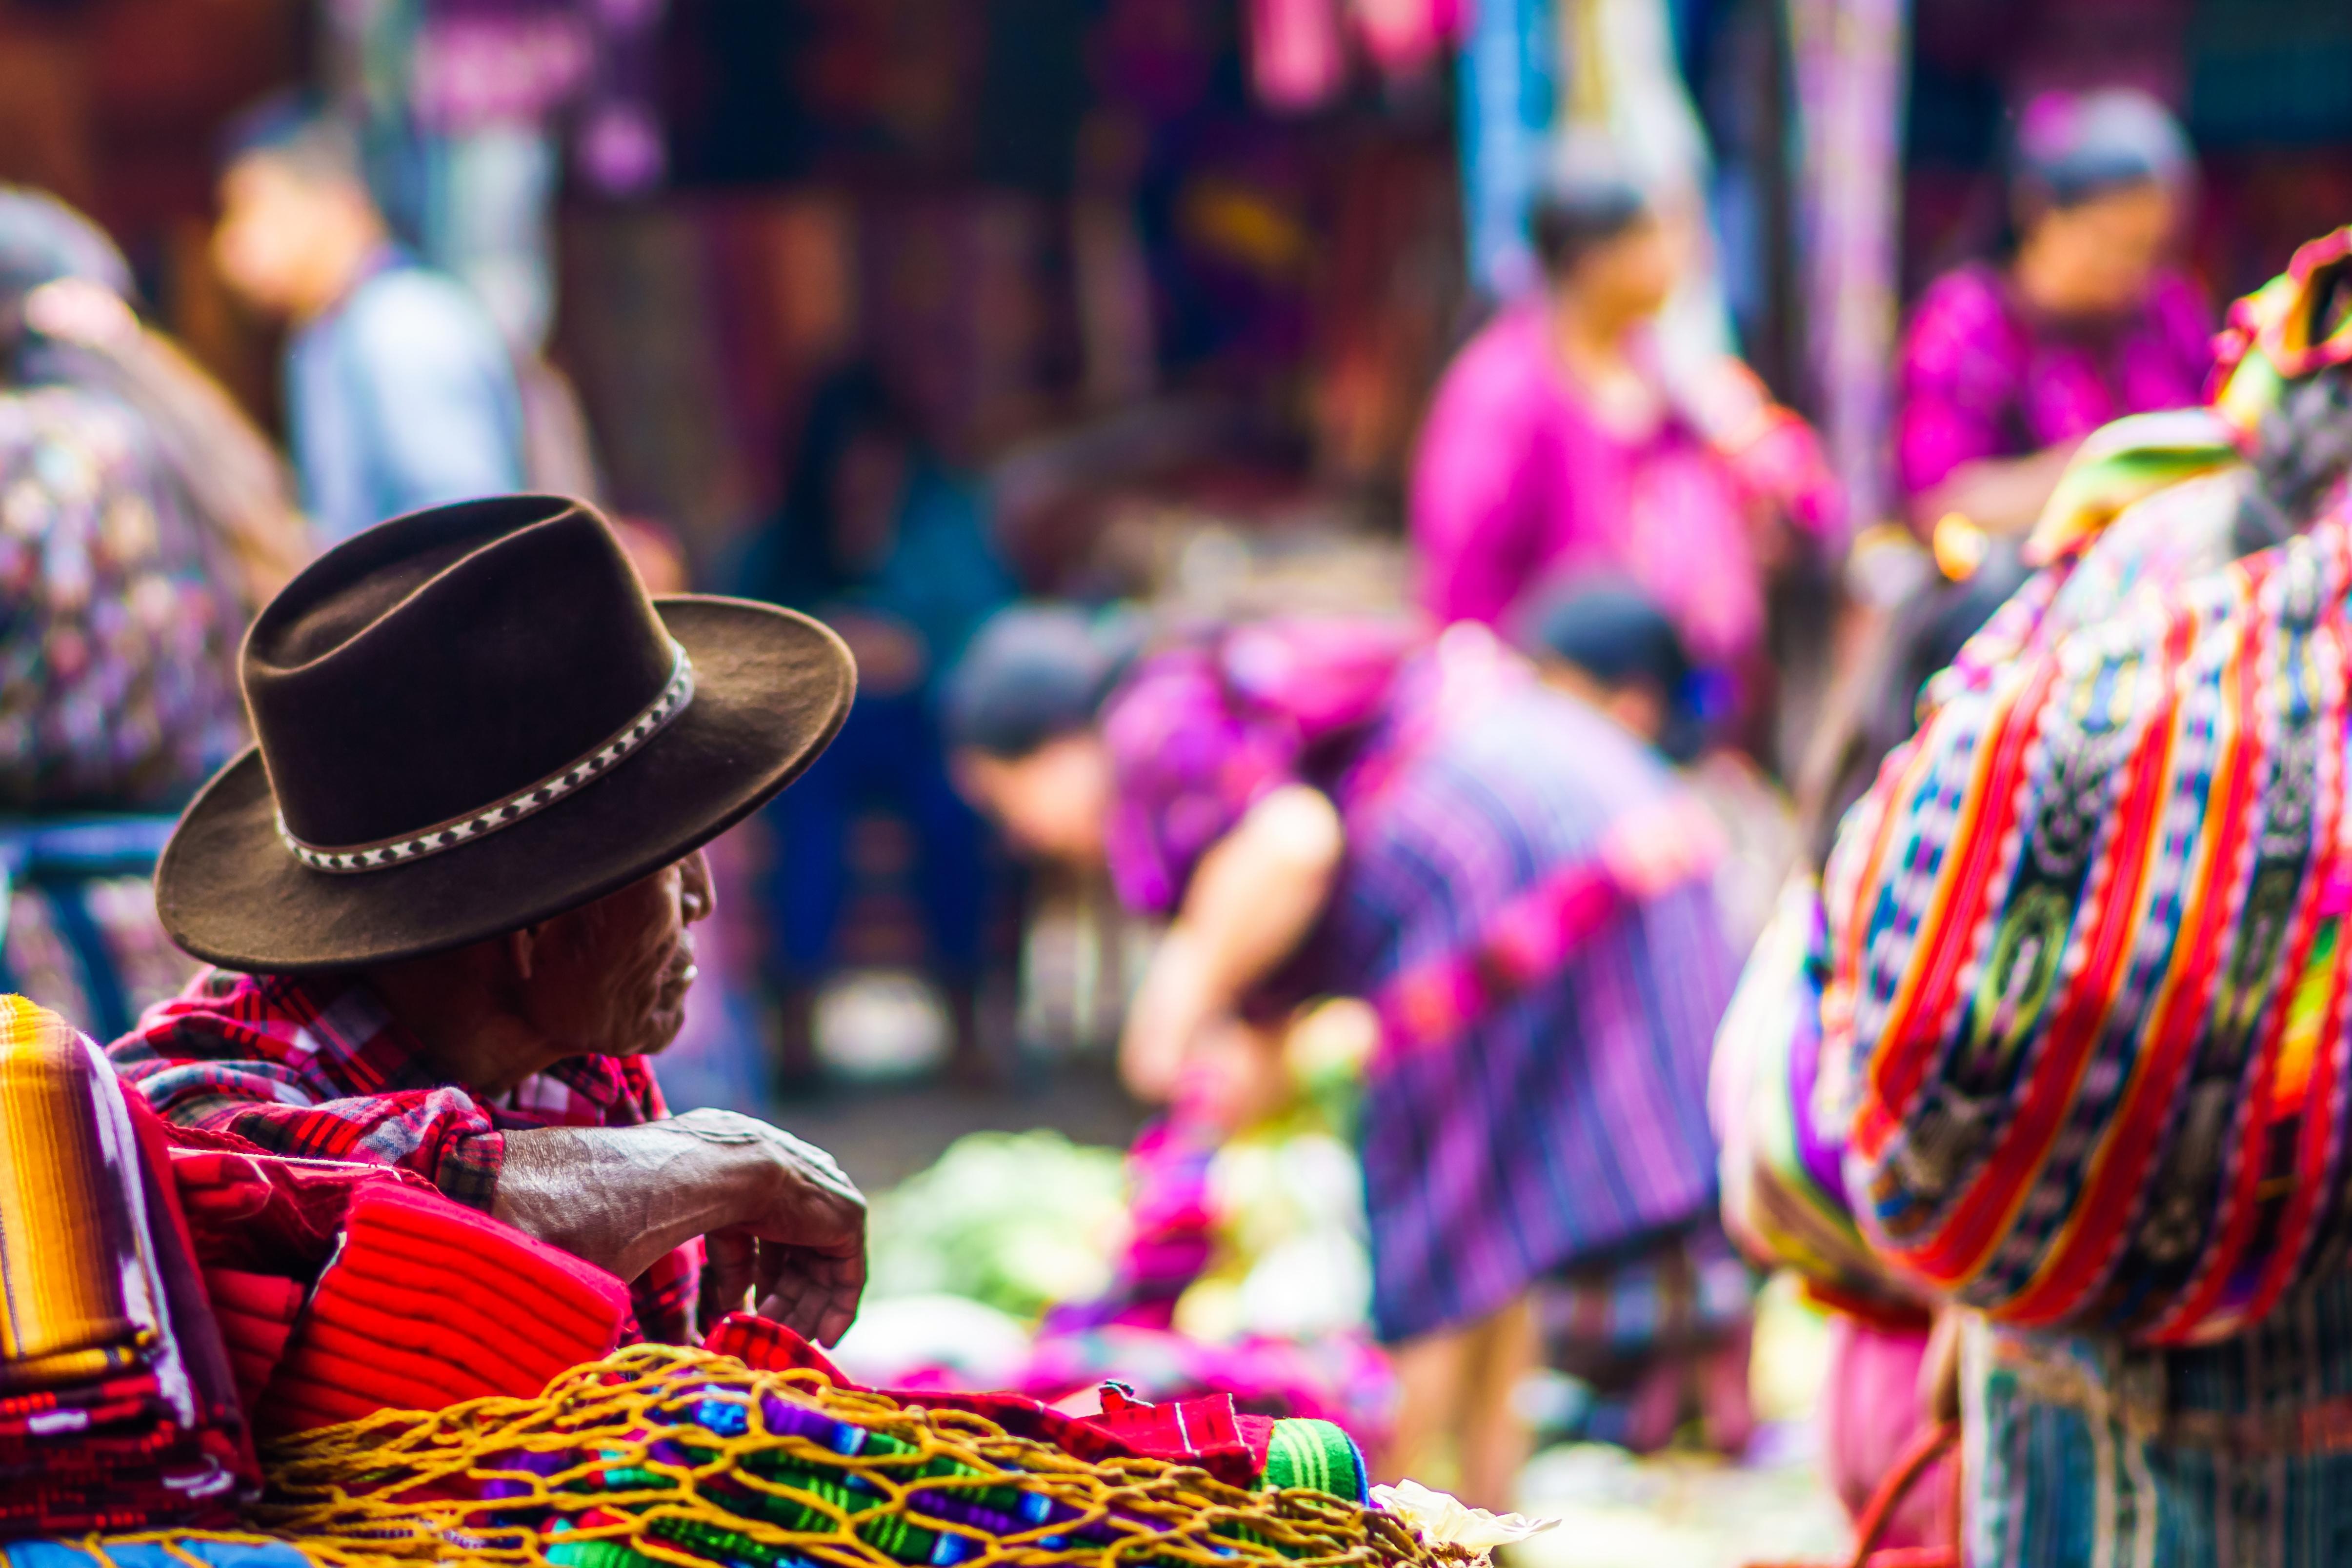 Nom : Chichicastenango PVT Guatemala.jpg Affichages : 147 Taille : 2,85 Mo